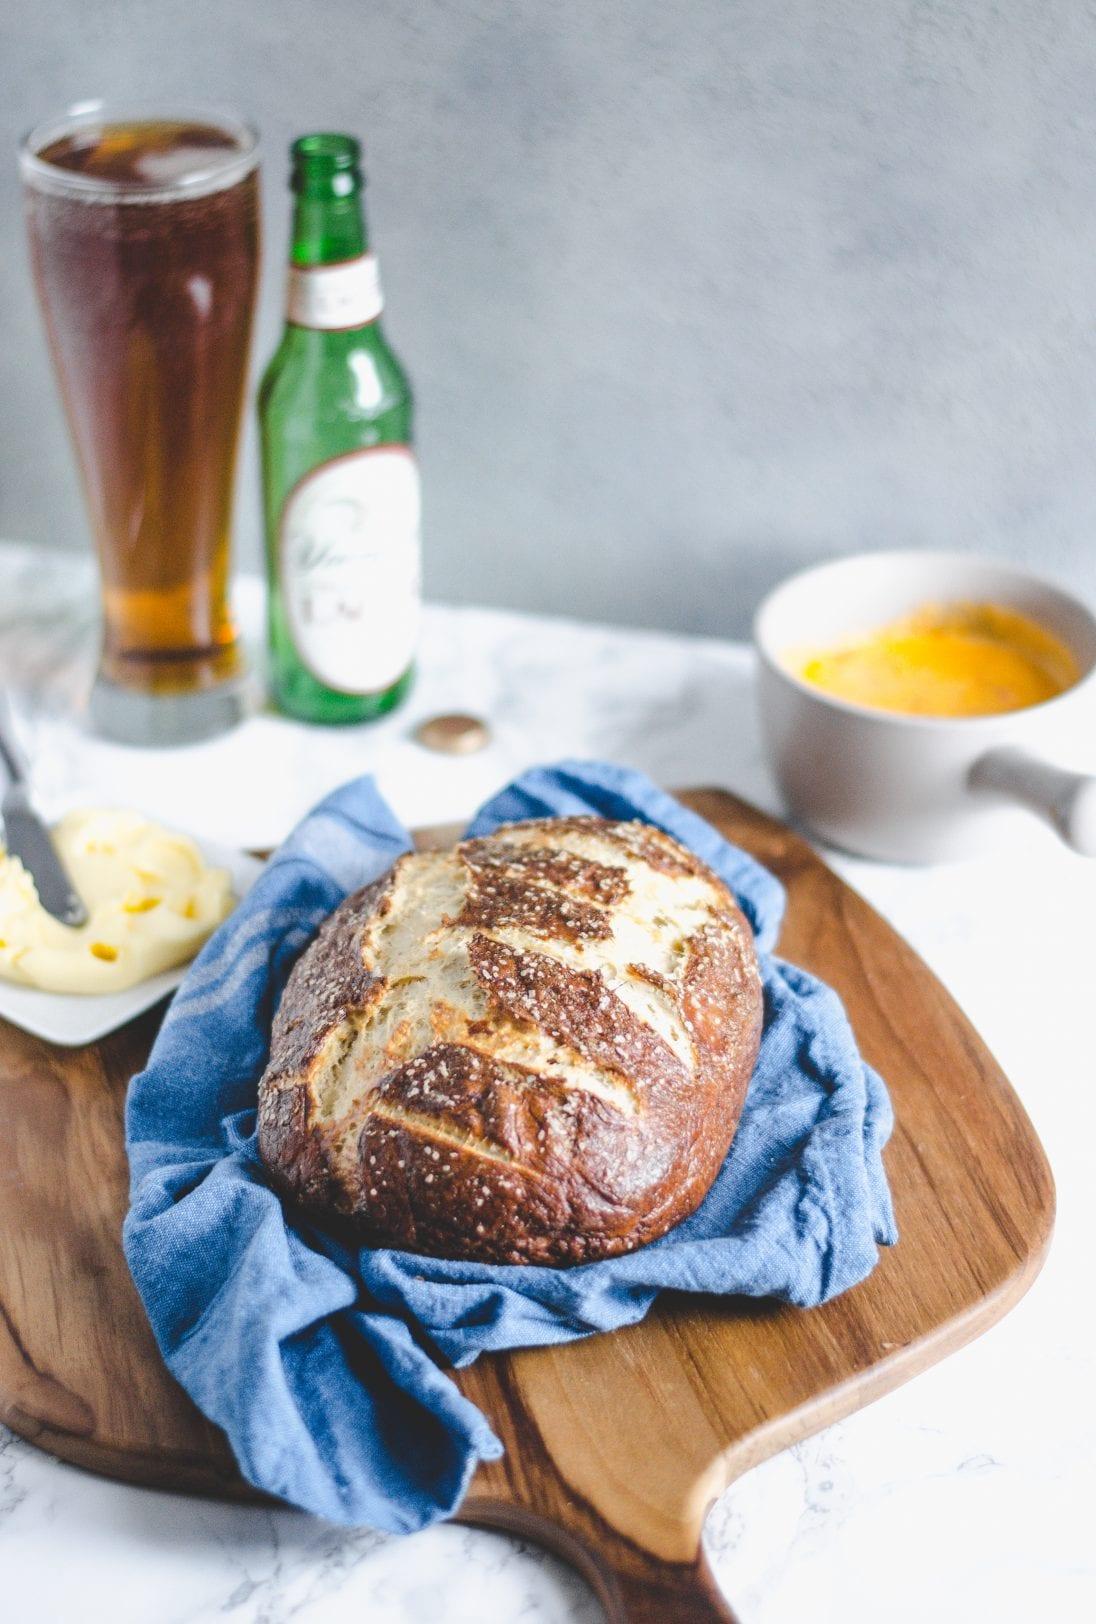 pretzel bread laying on a towel